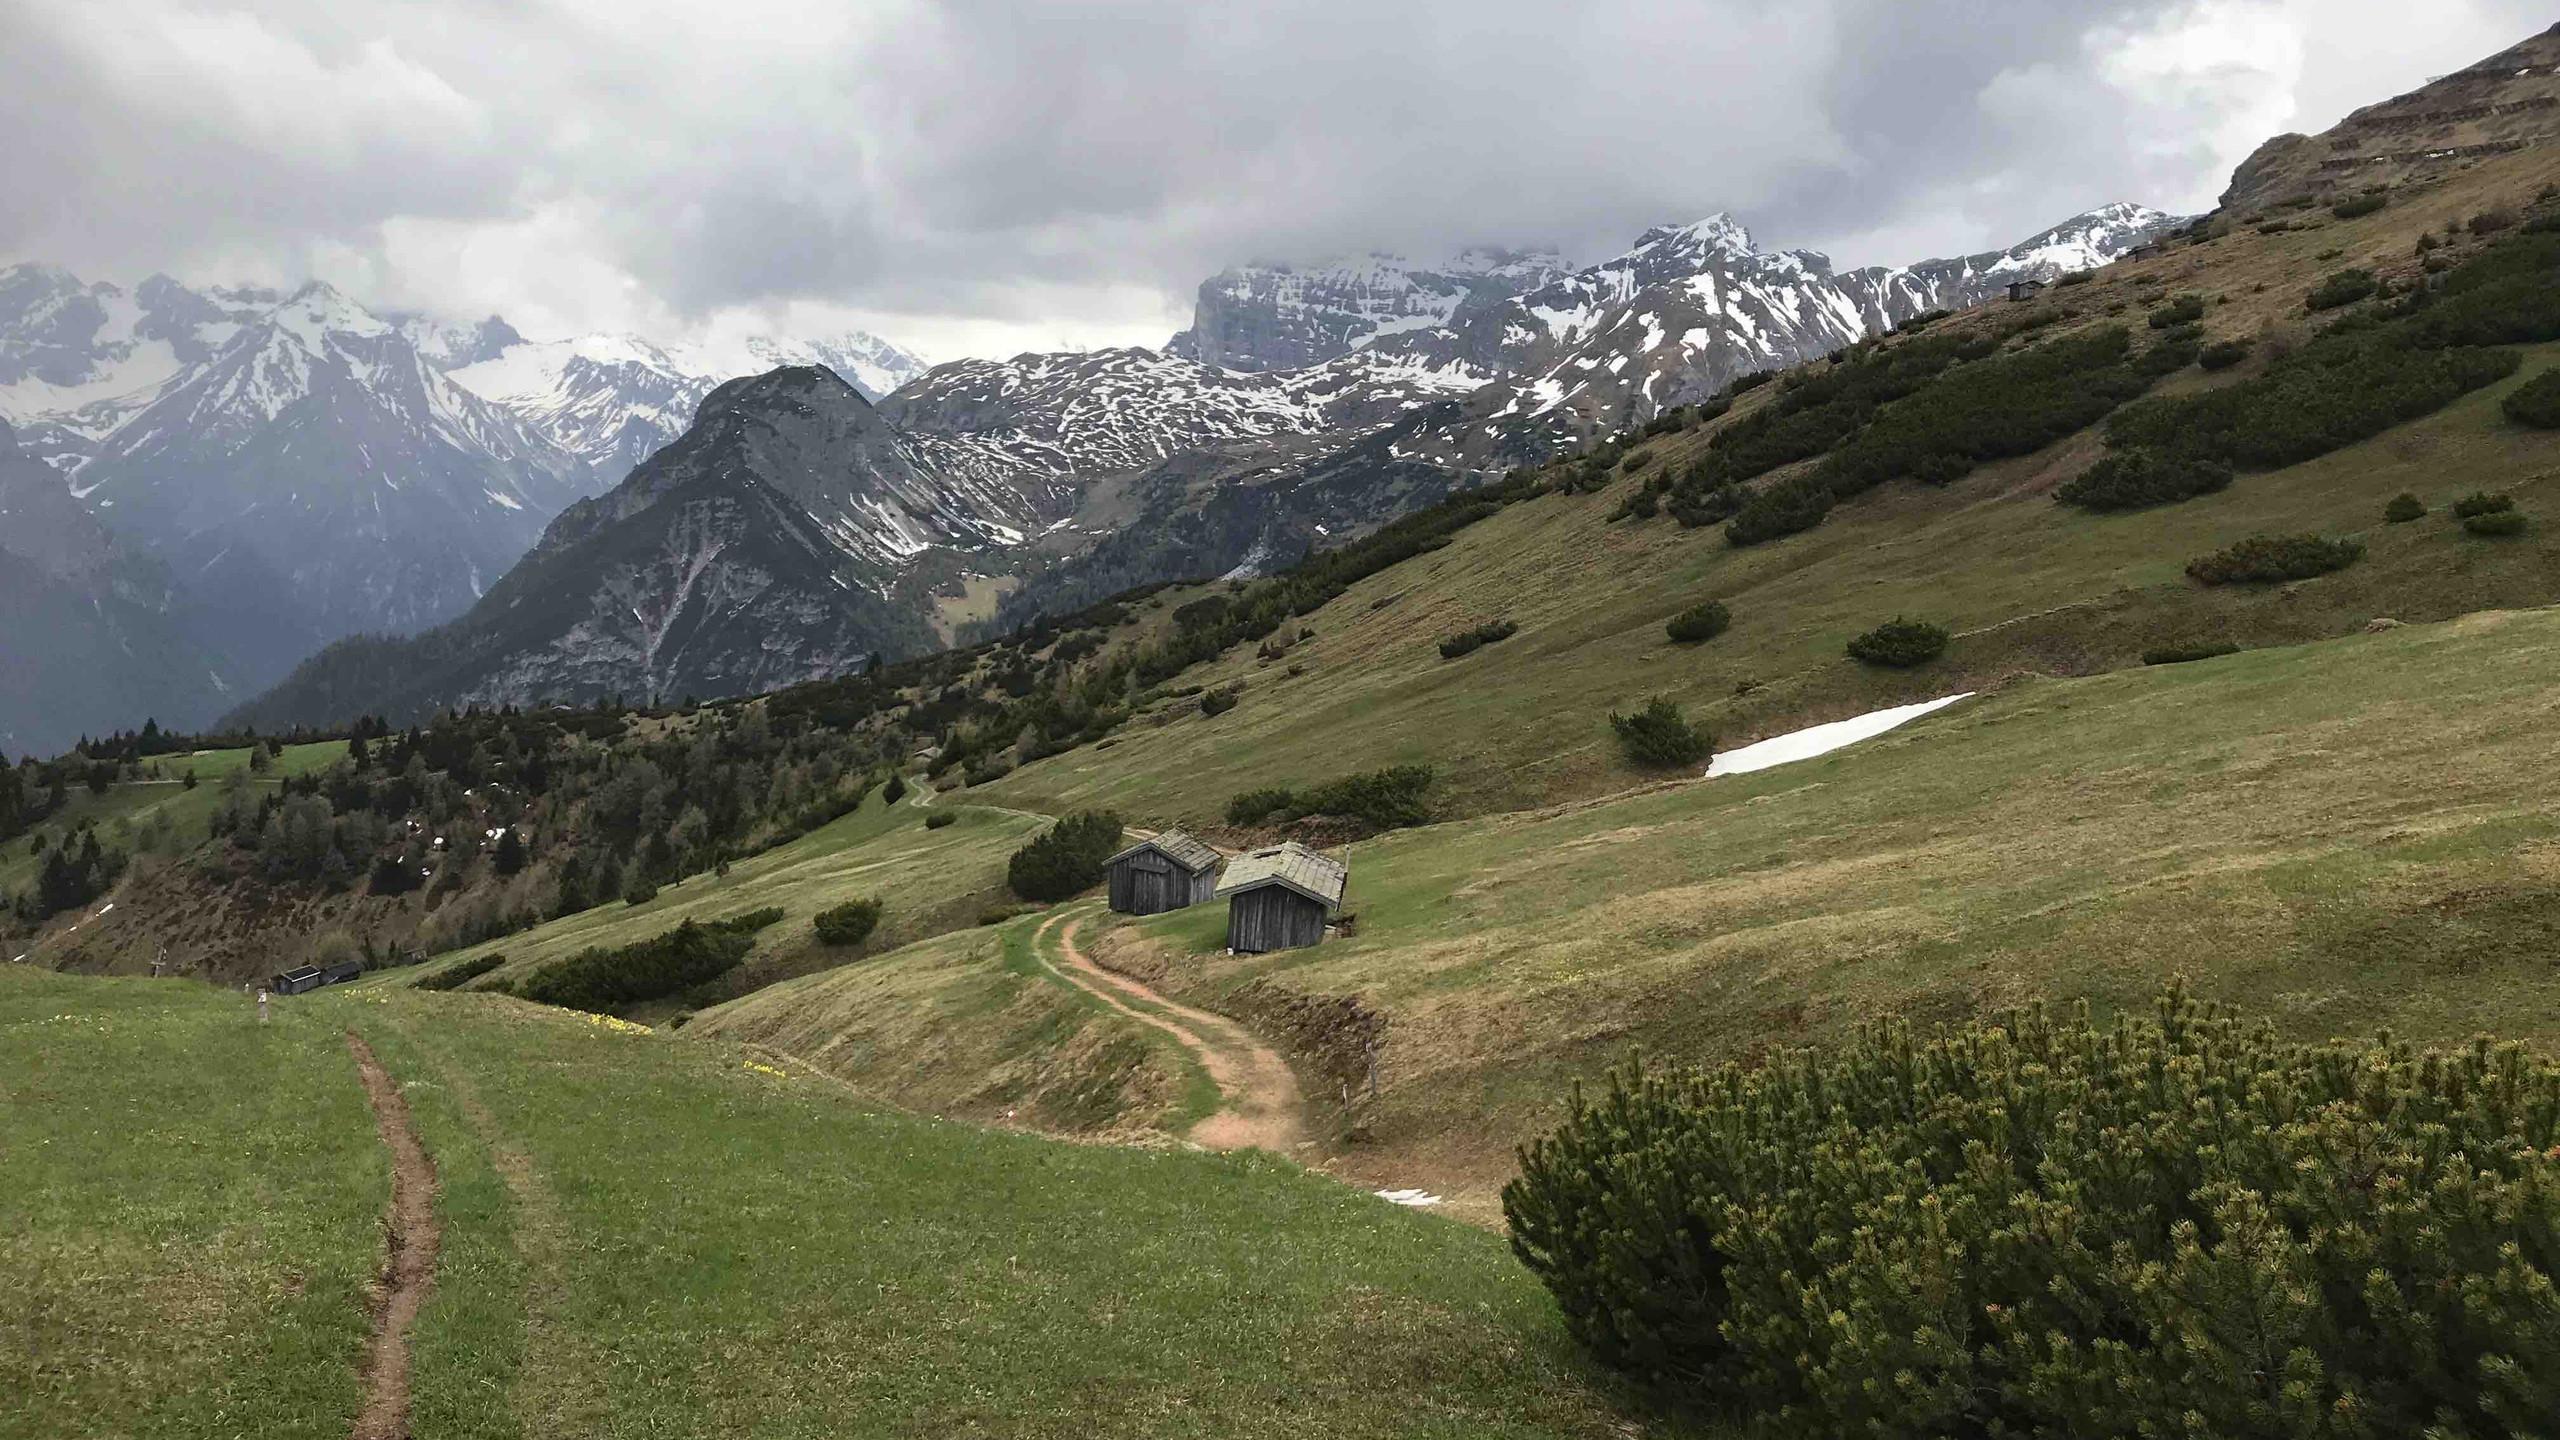 Trail bergab zum Forstweg, Biketour Gschnitztal